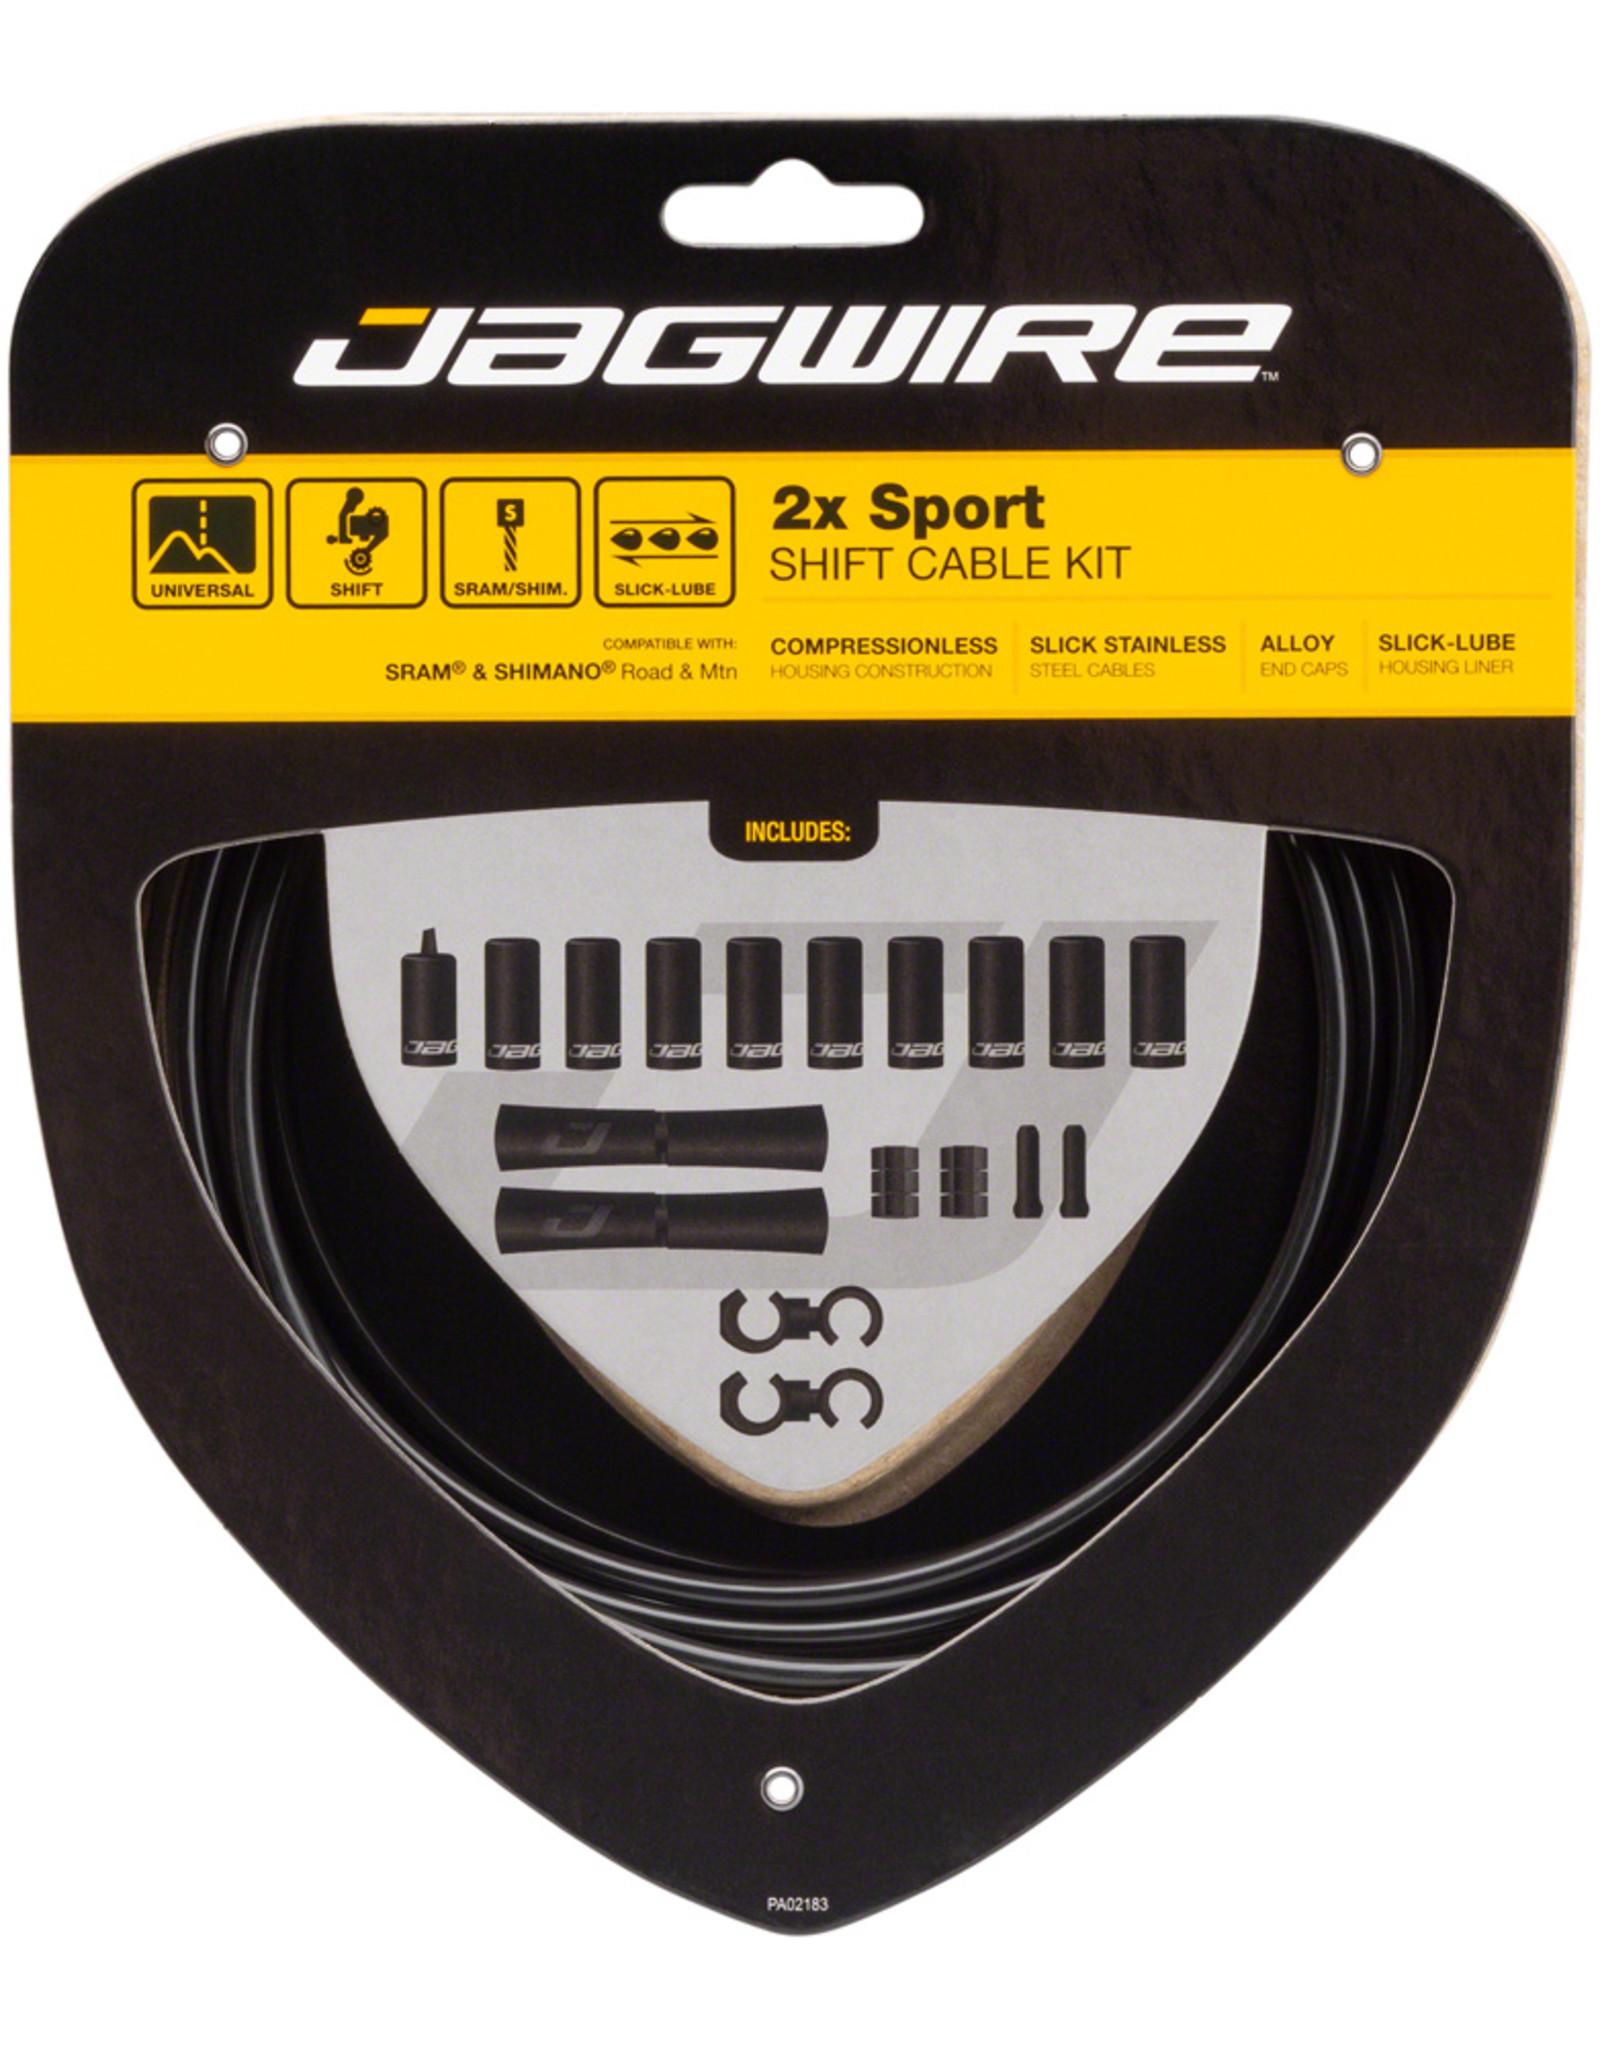 Jagwire Jagwire 2x Sport Shift Cable Kit SRAM/Shimano, Black